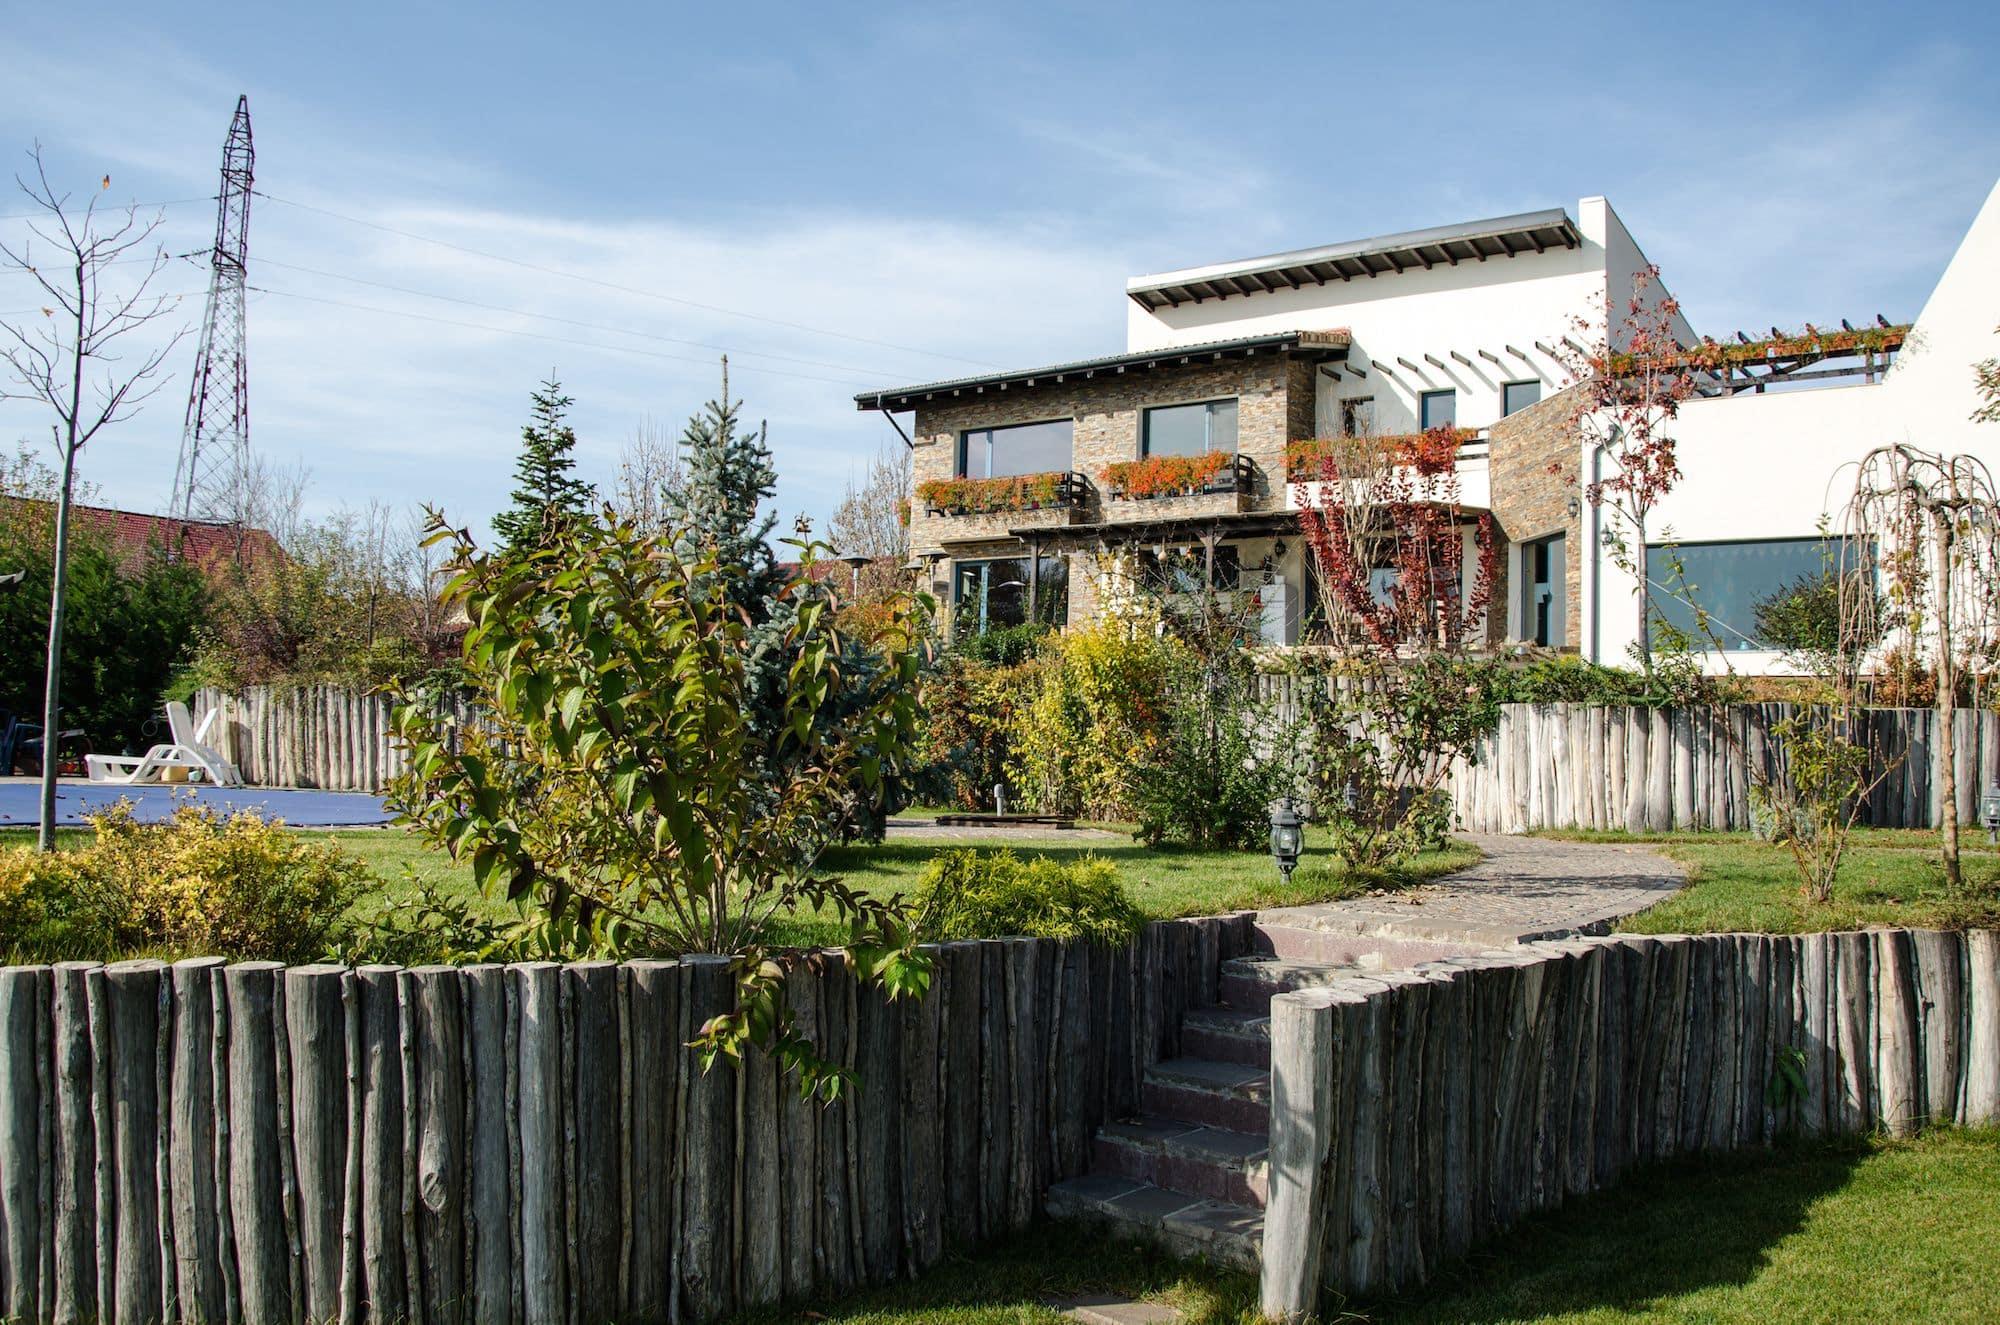 Poze gradina amenajata in Bucuresti